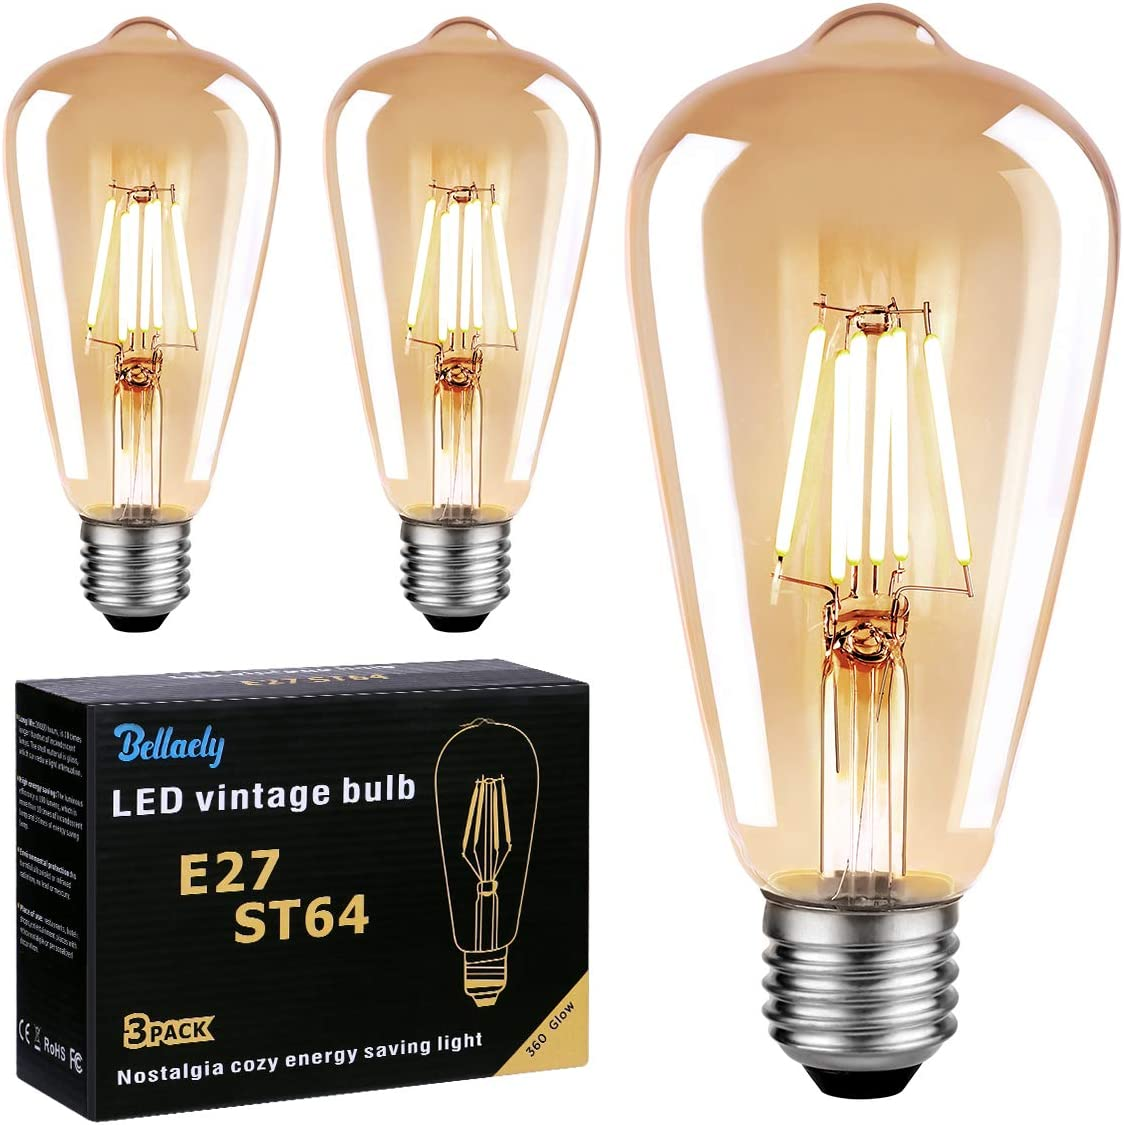 Bombilla Vintage E27 LED, Bellaely Bombilla Filamento LED ST64 6W Equivalente a 60W, 600LM 2700K E27 Retro Edison Bombillas Decorativas Lámpara Ambar Cálido, No Regulable - Pack de 3